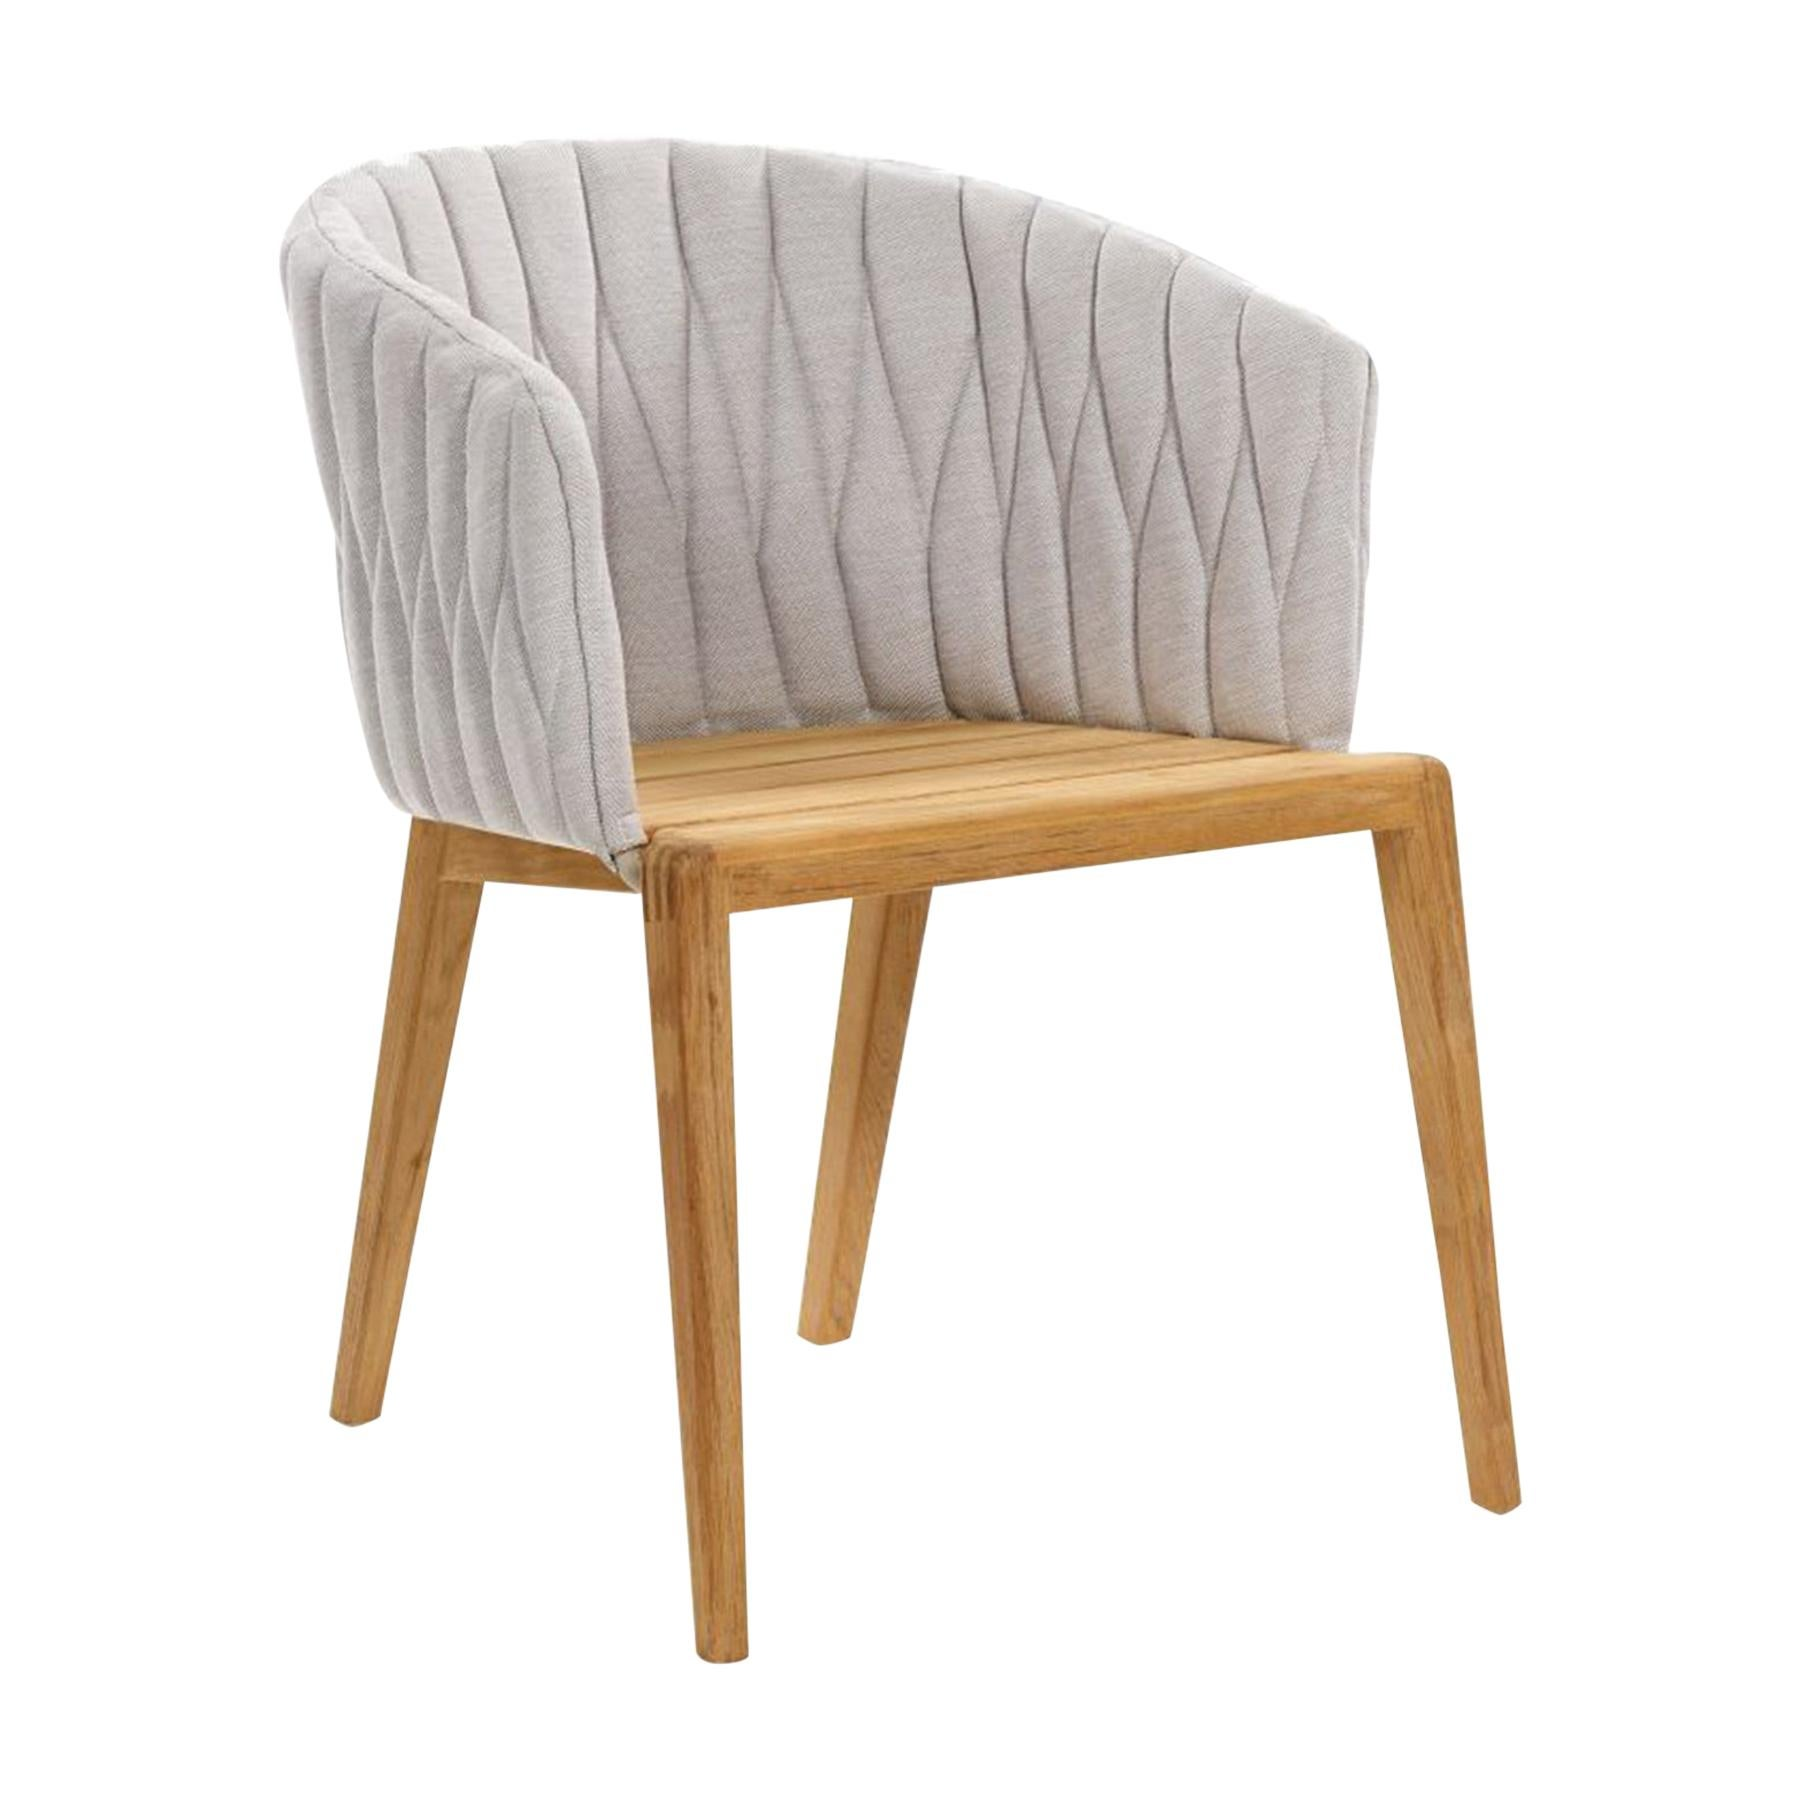 Outdoor Royal Botania Calypso Chair designed by Kris Van Puyvelde